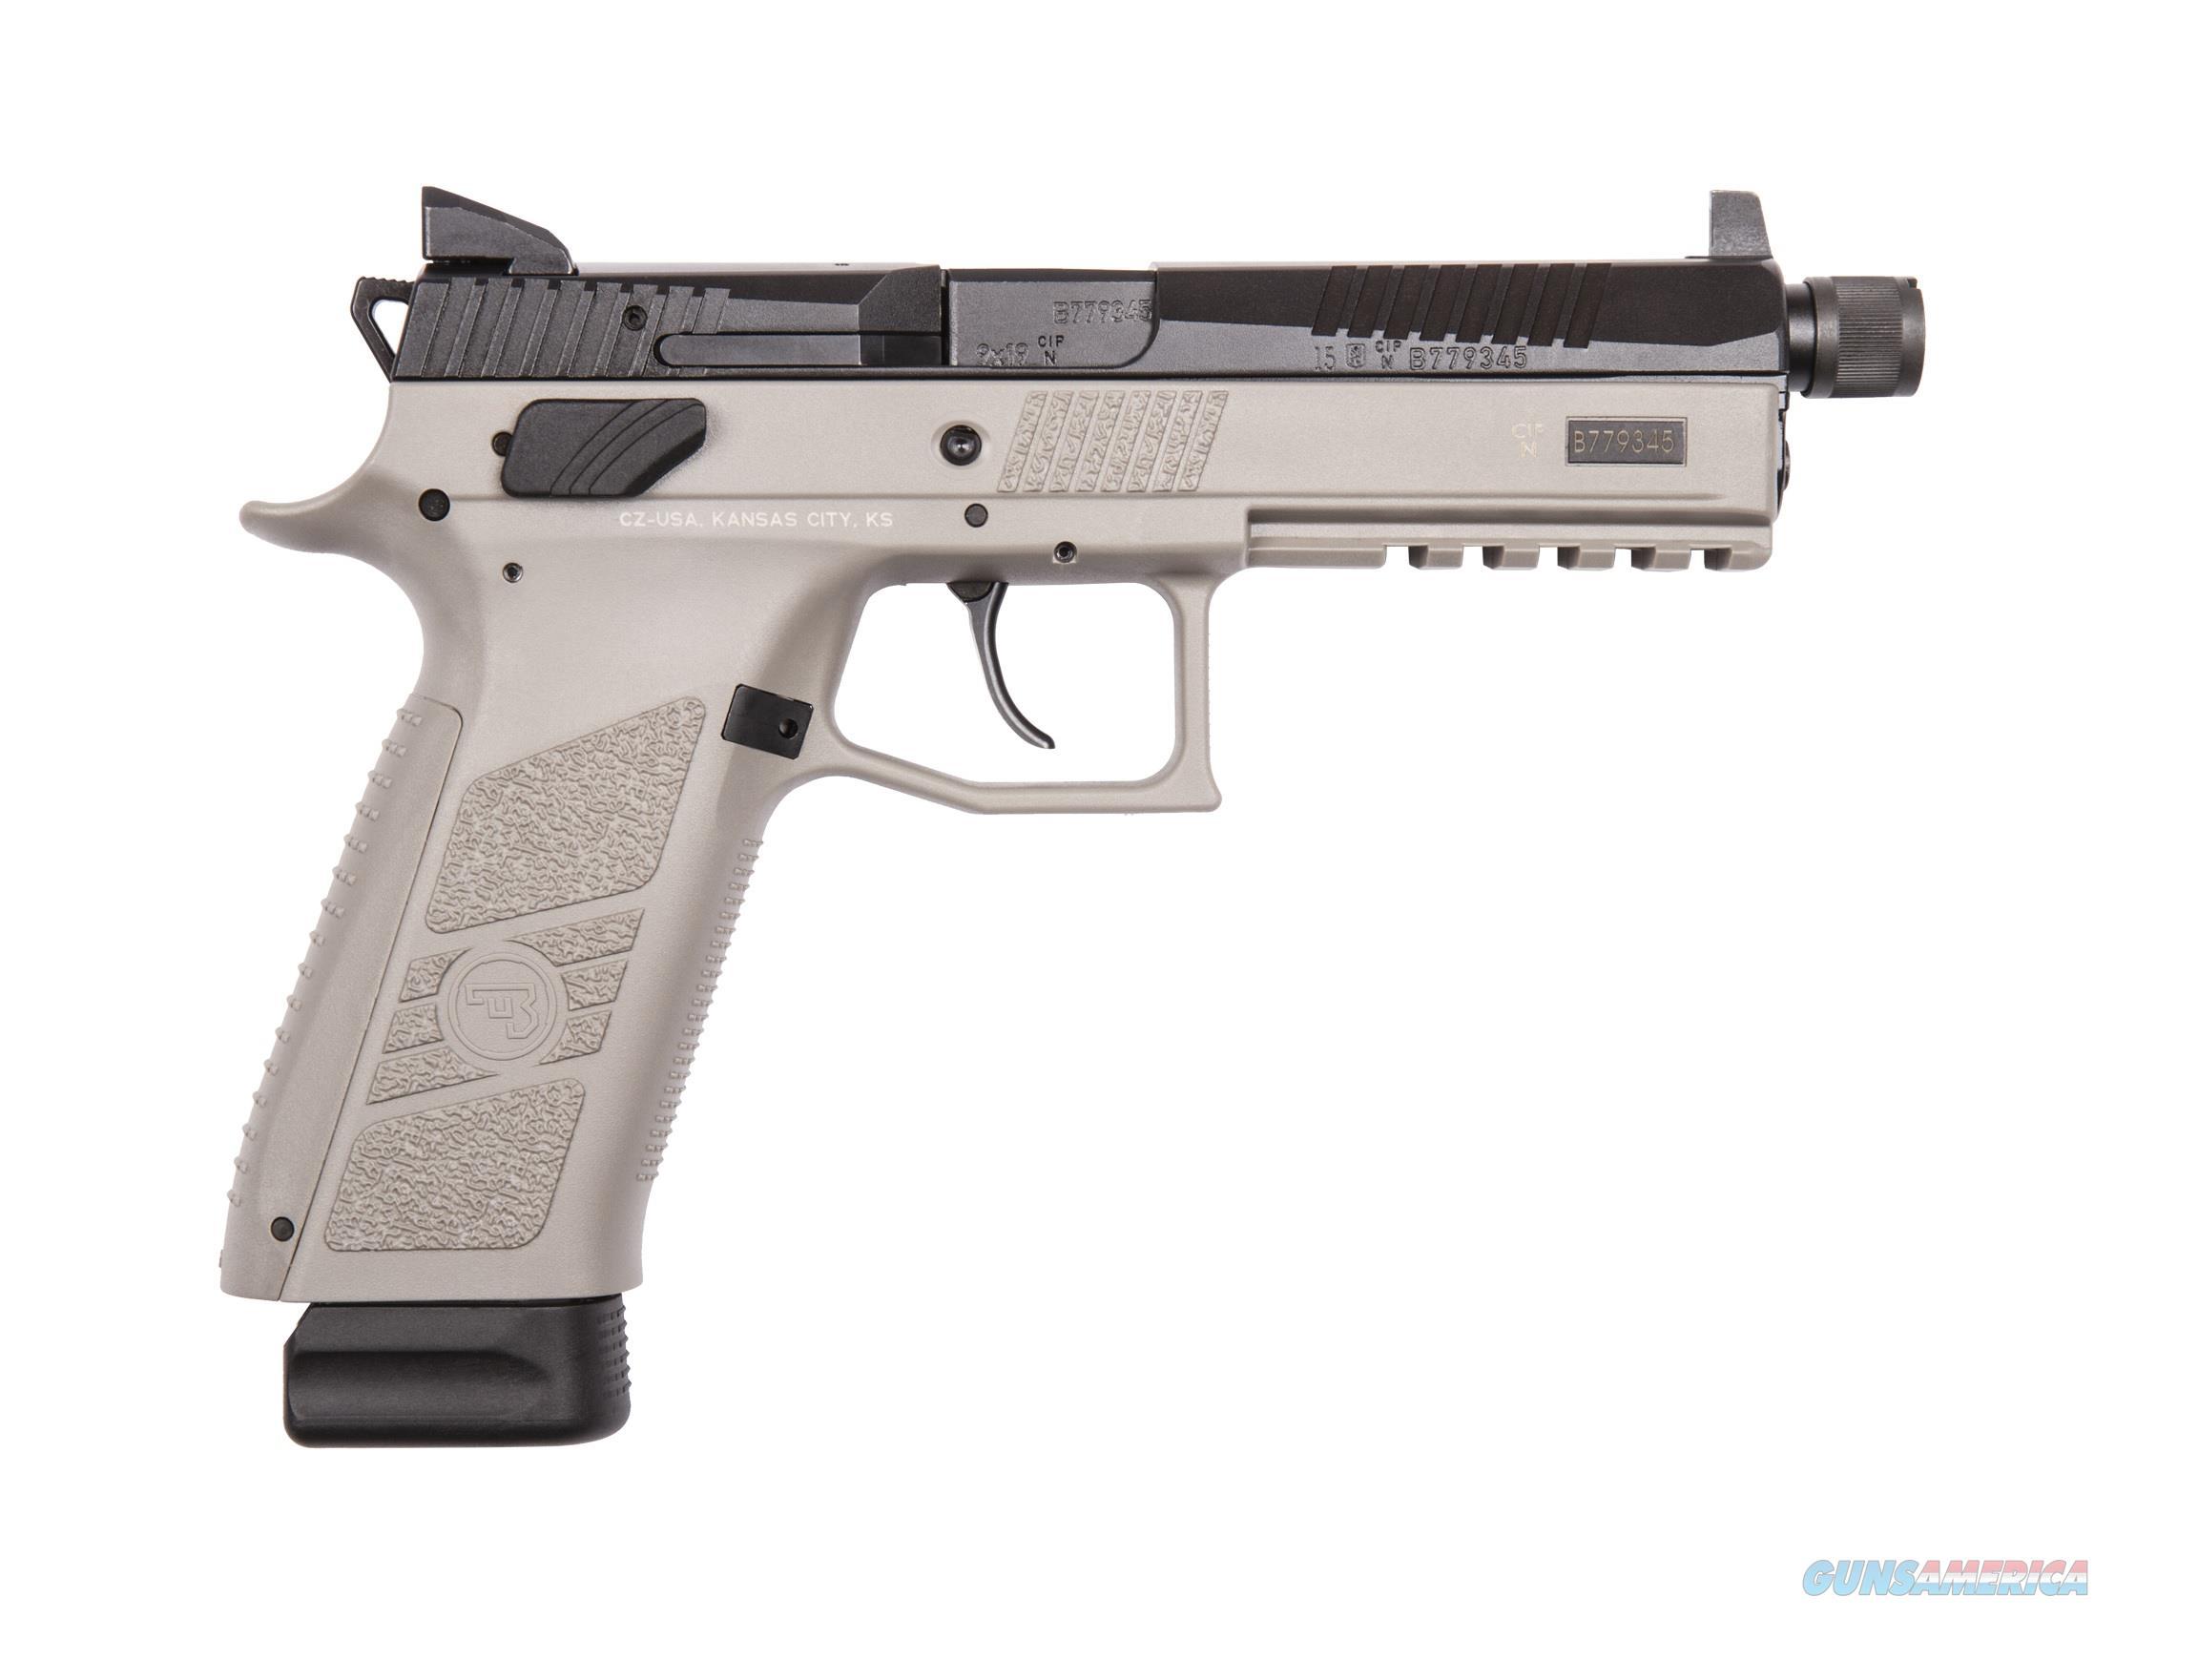 CZ-USA CZ P-09 Urban Grey Suppressor-Ready 9mm 91269  Guns > Pistols > CZ Pistols